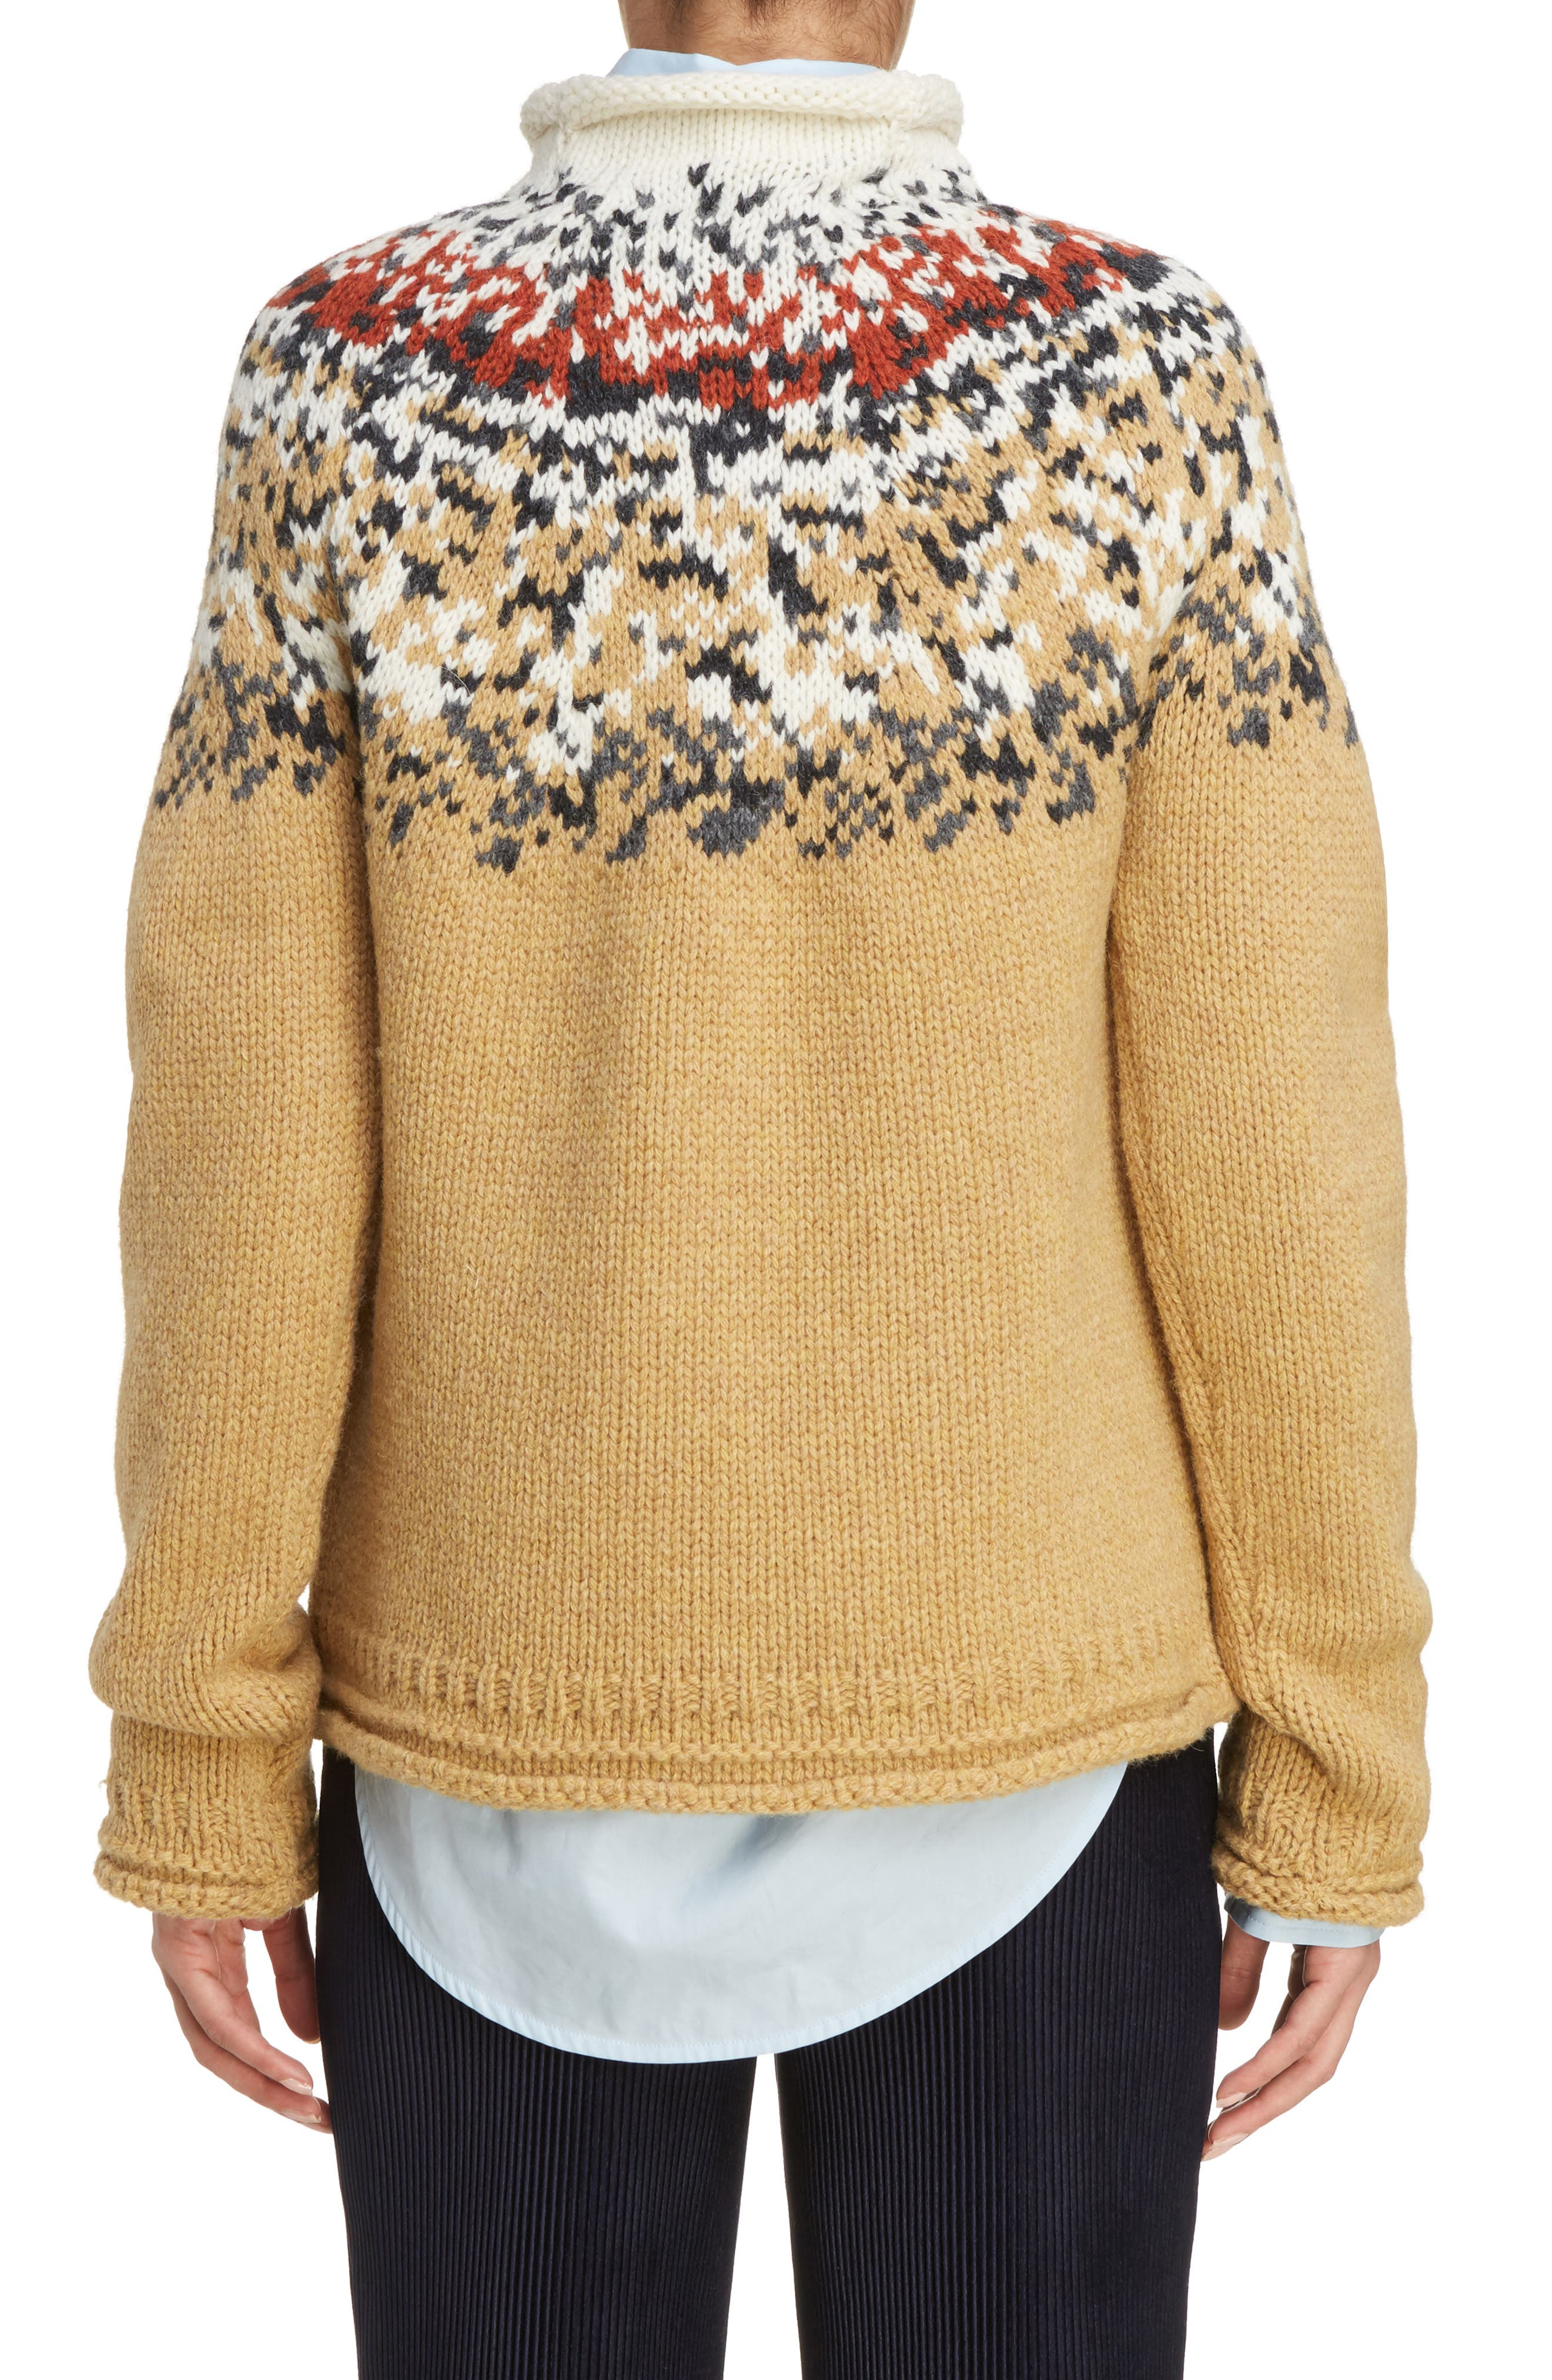 Sirius Heavy Icelandic High Neck Sweater,                             Alternate thumbnail 2, color,                             250